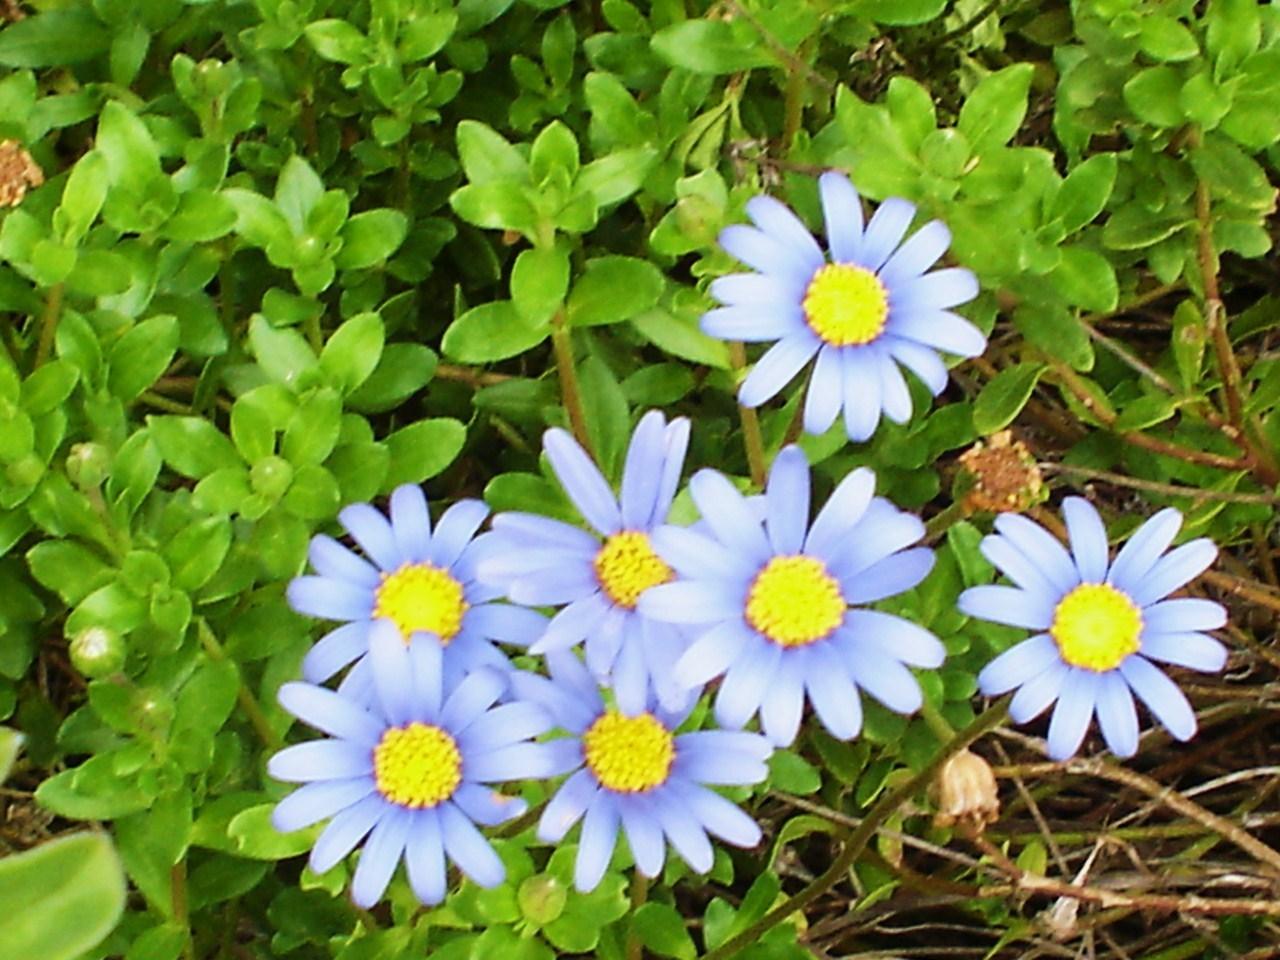 My Blue Daisies